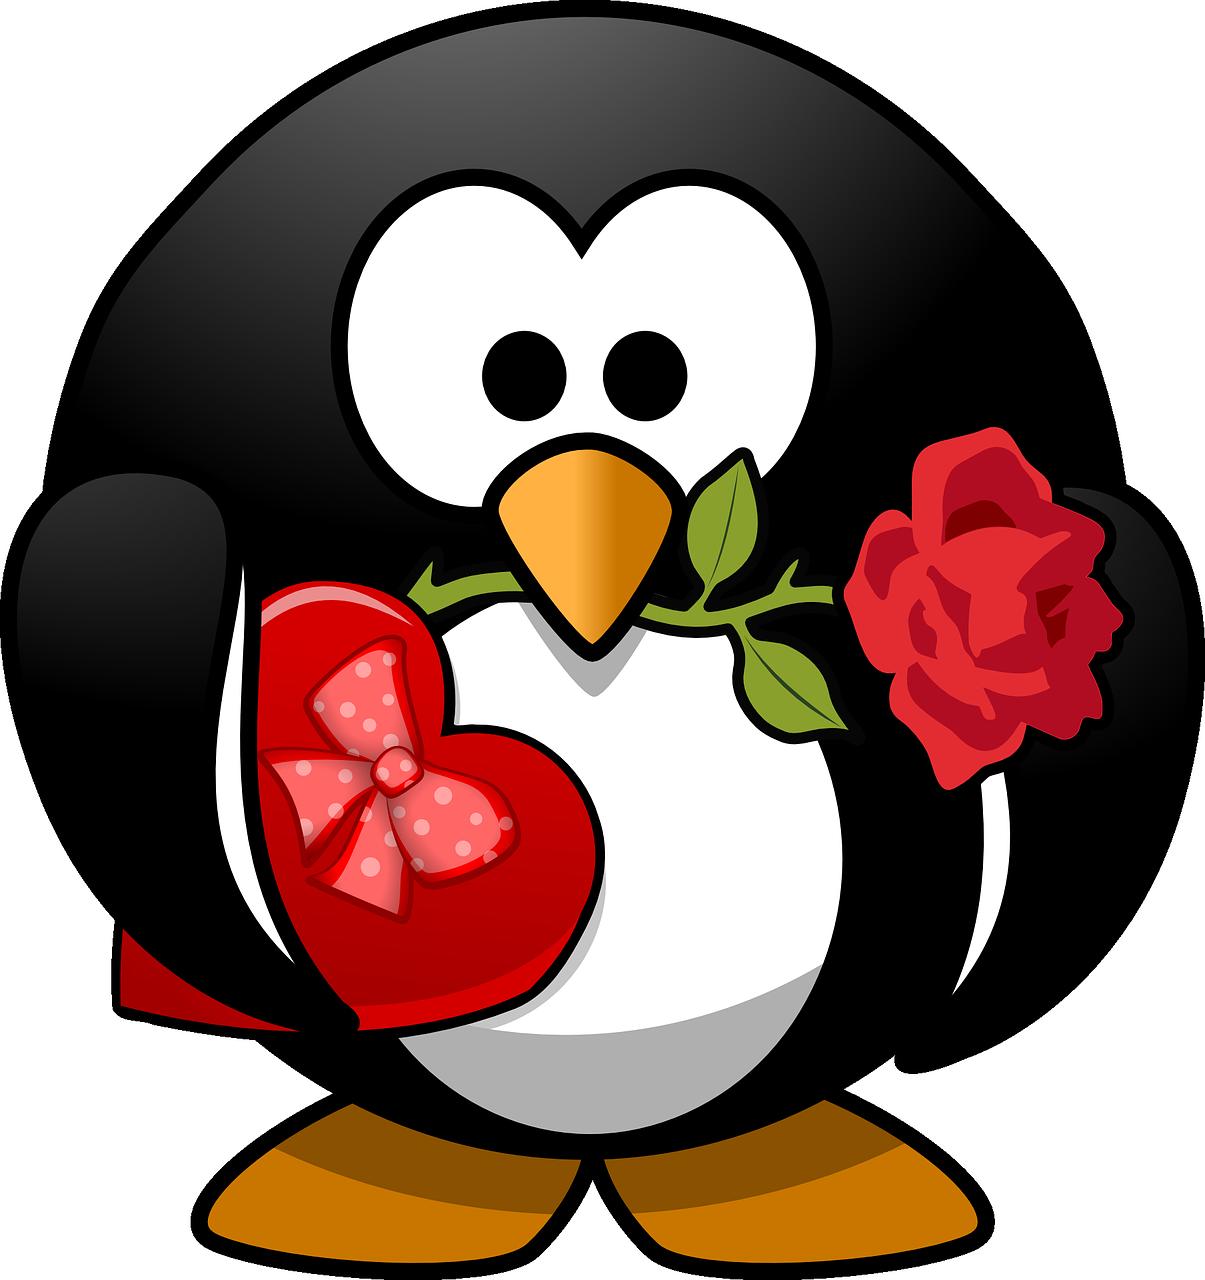 penguin-161288_1280